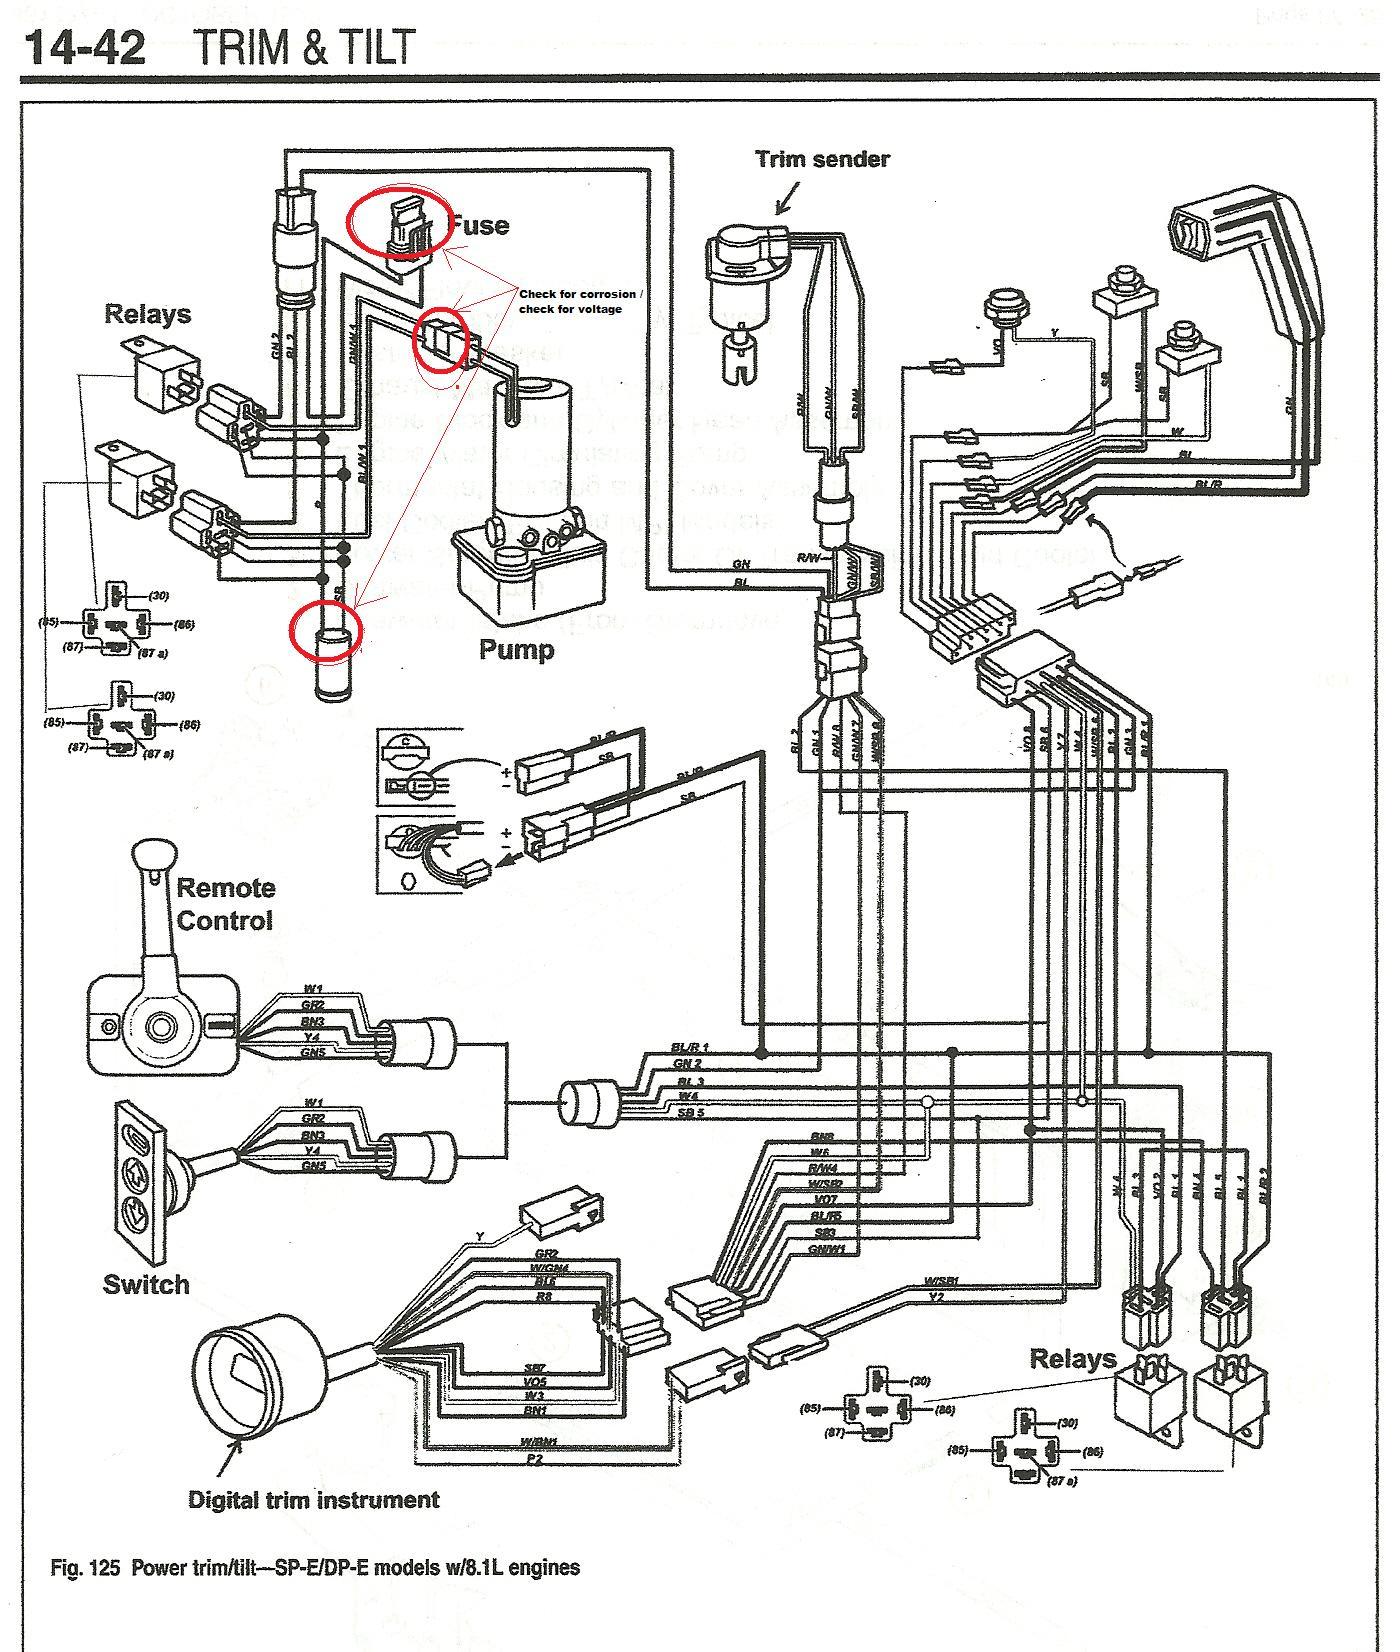 2003 Bayliner 248sd Wiring Diagram